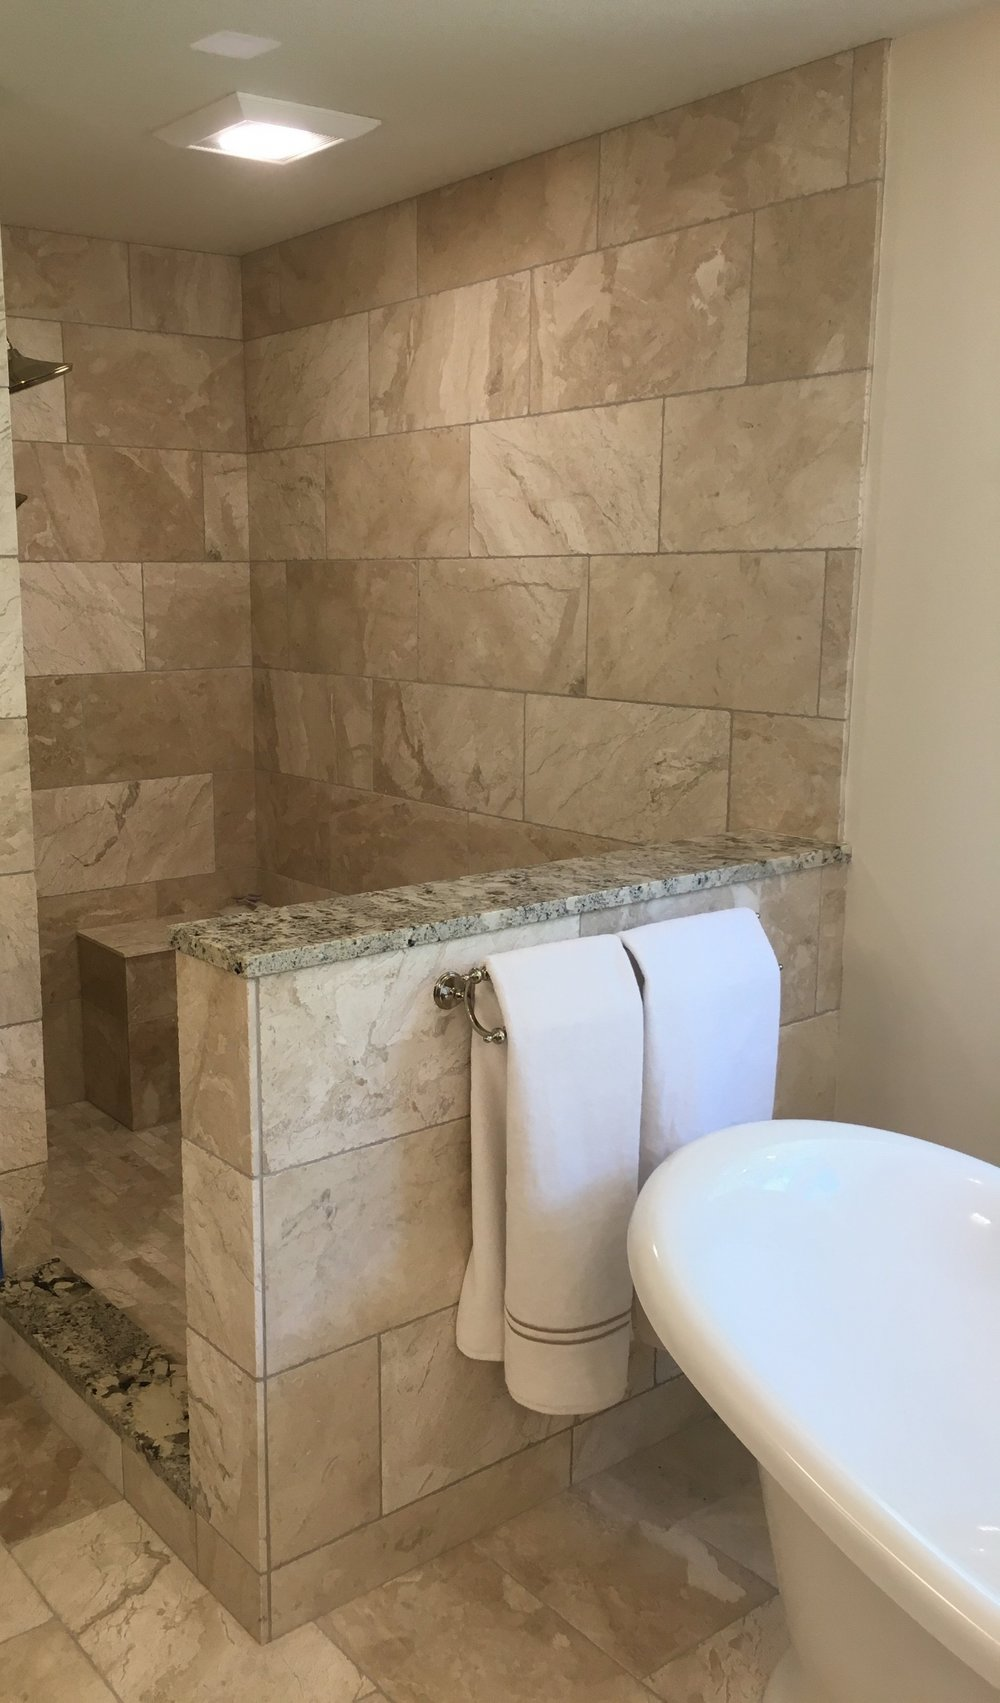 AFTER-an elegant marble walk-in shower